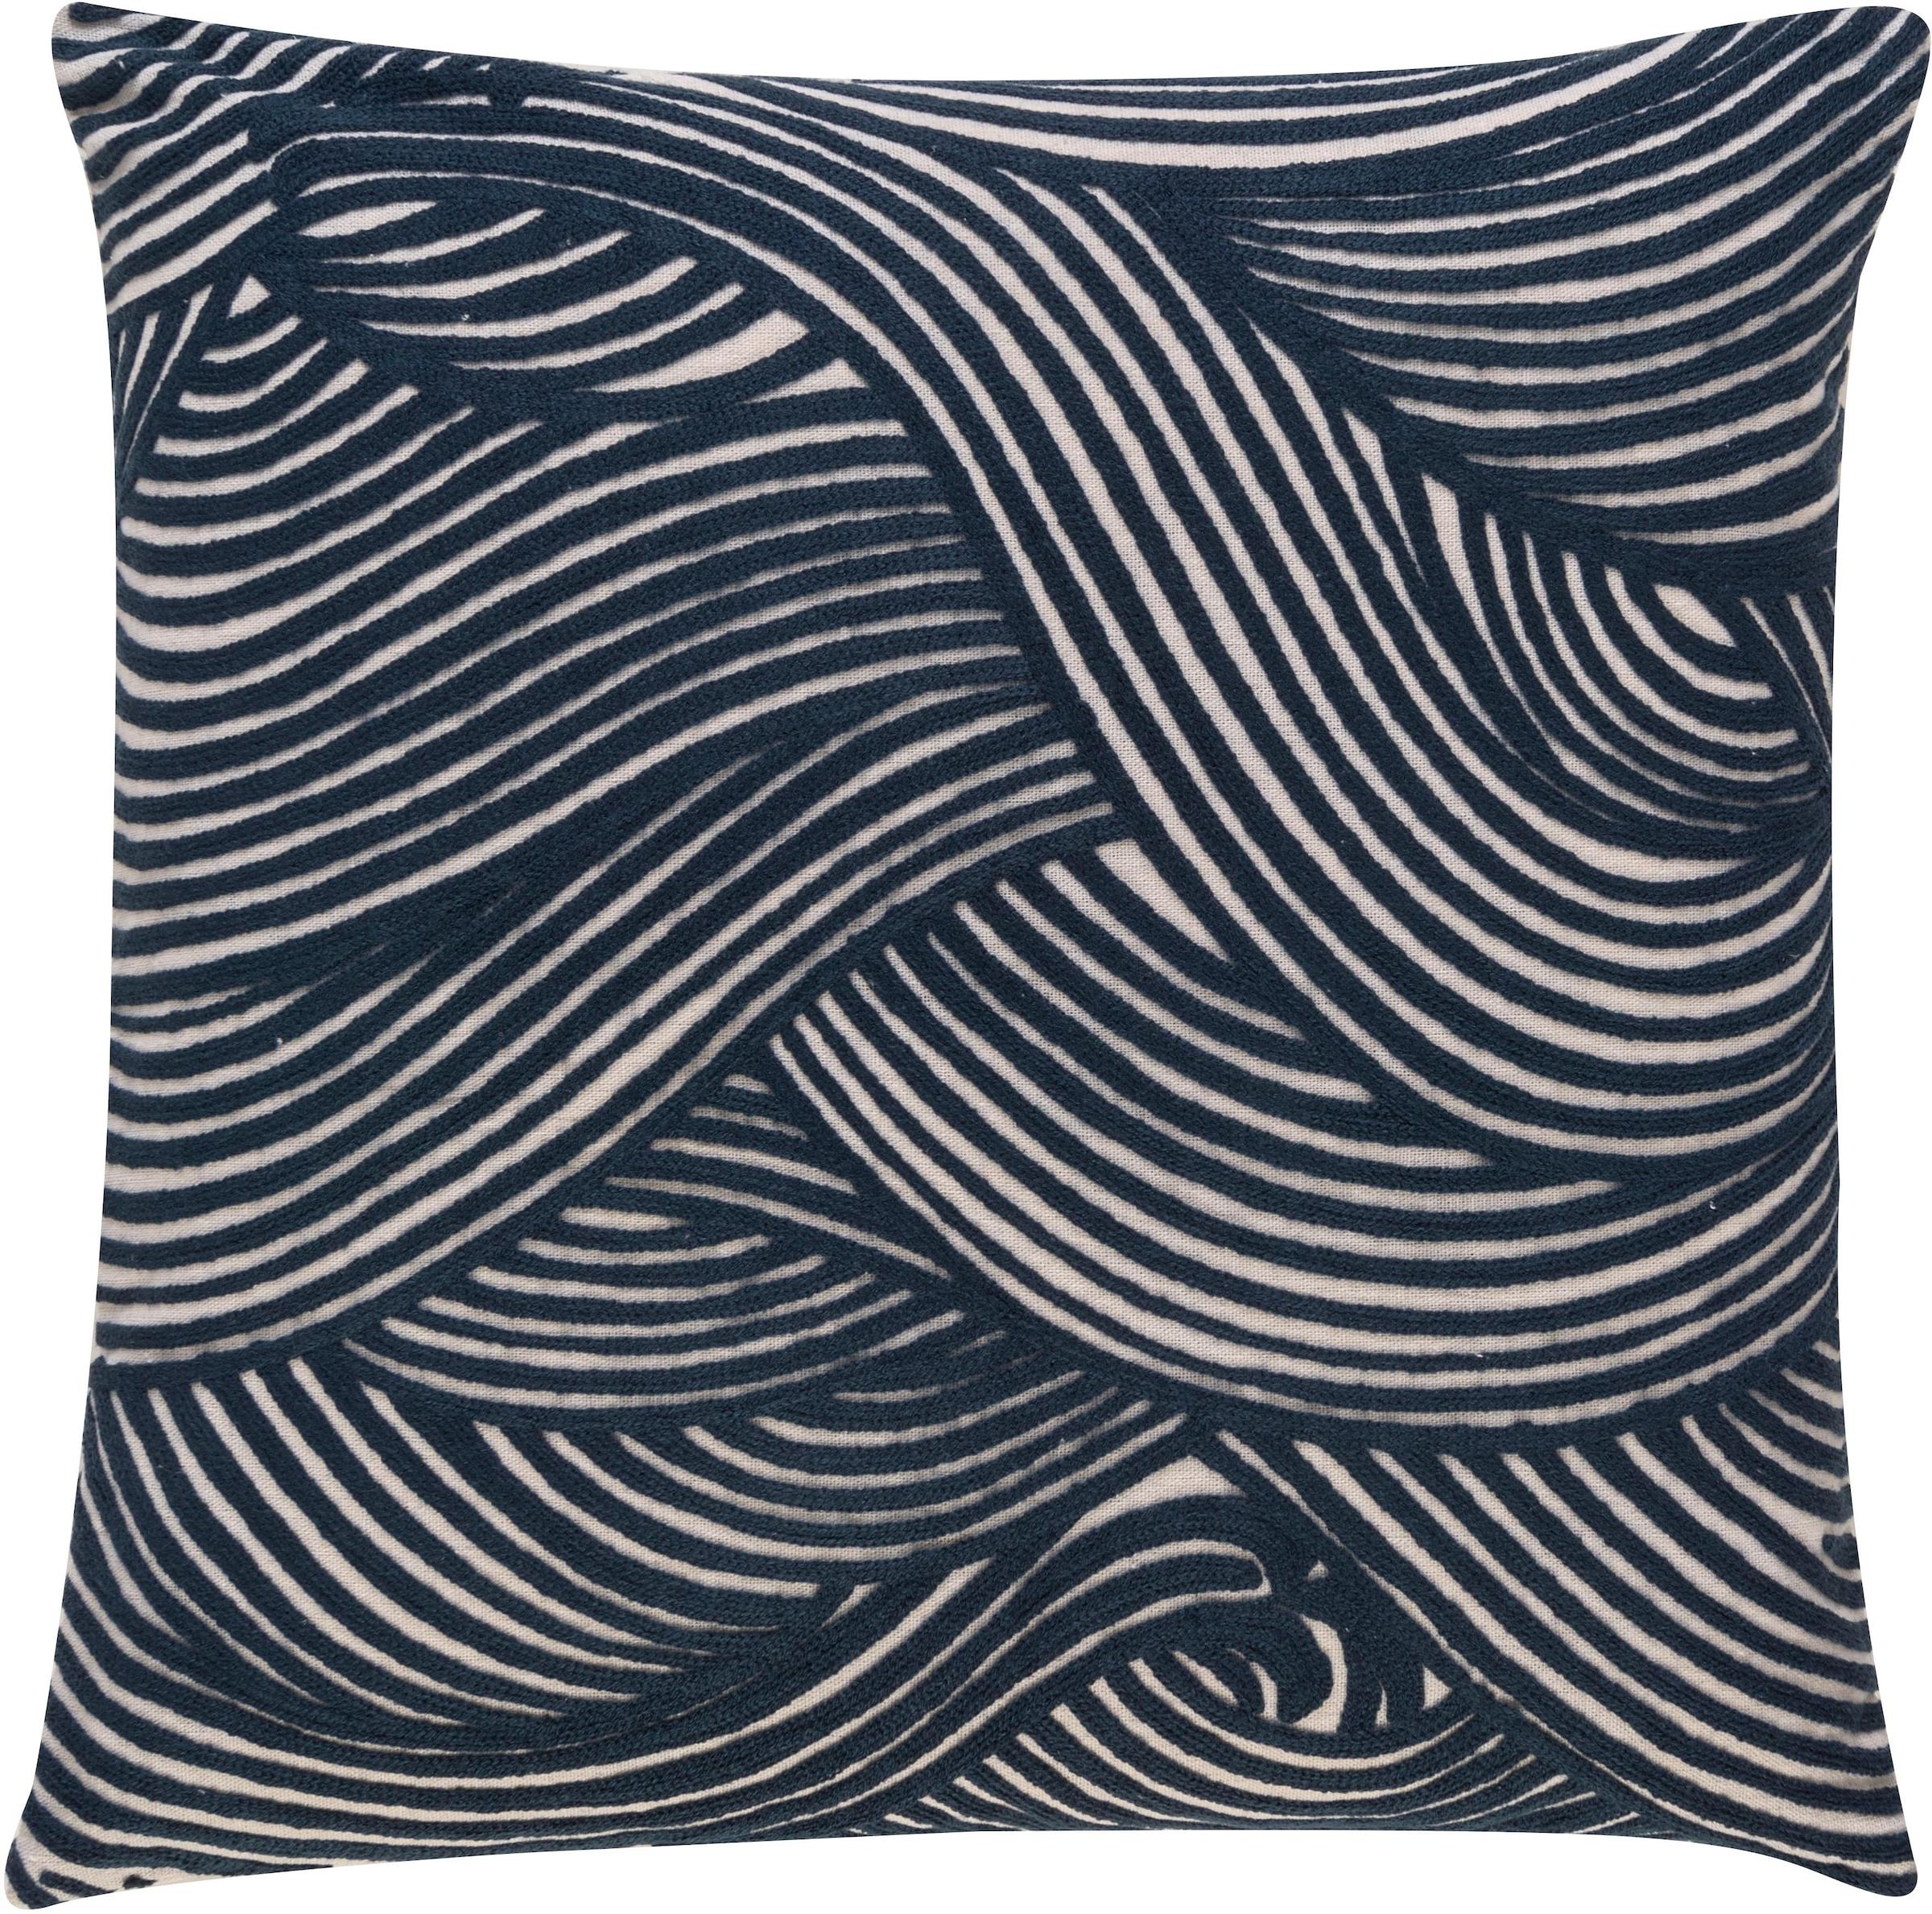 Image of Kissenhülle, »KI-H Wave«, BARBARA Home Collection